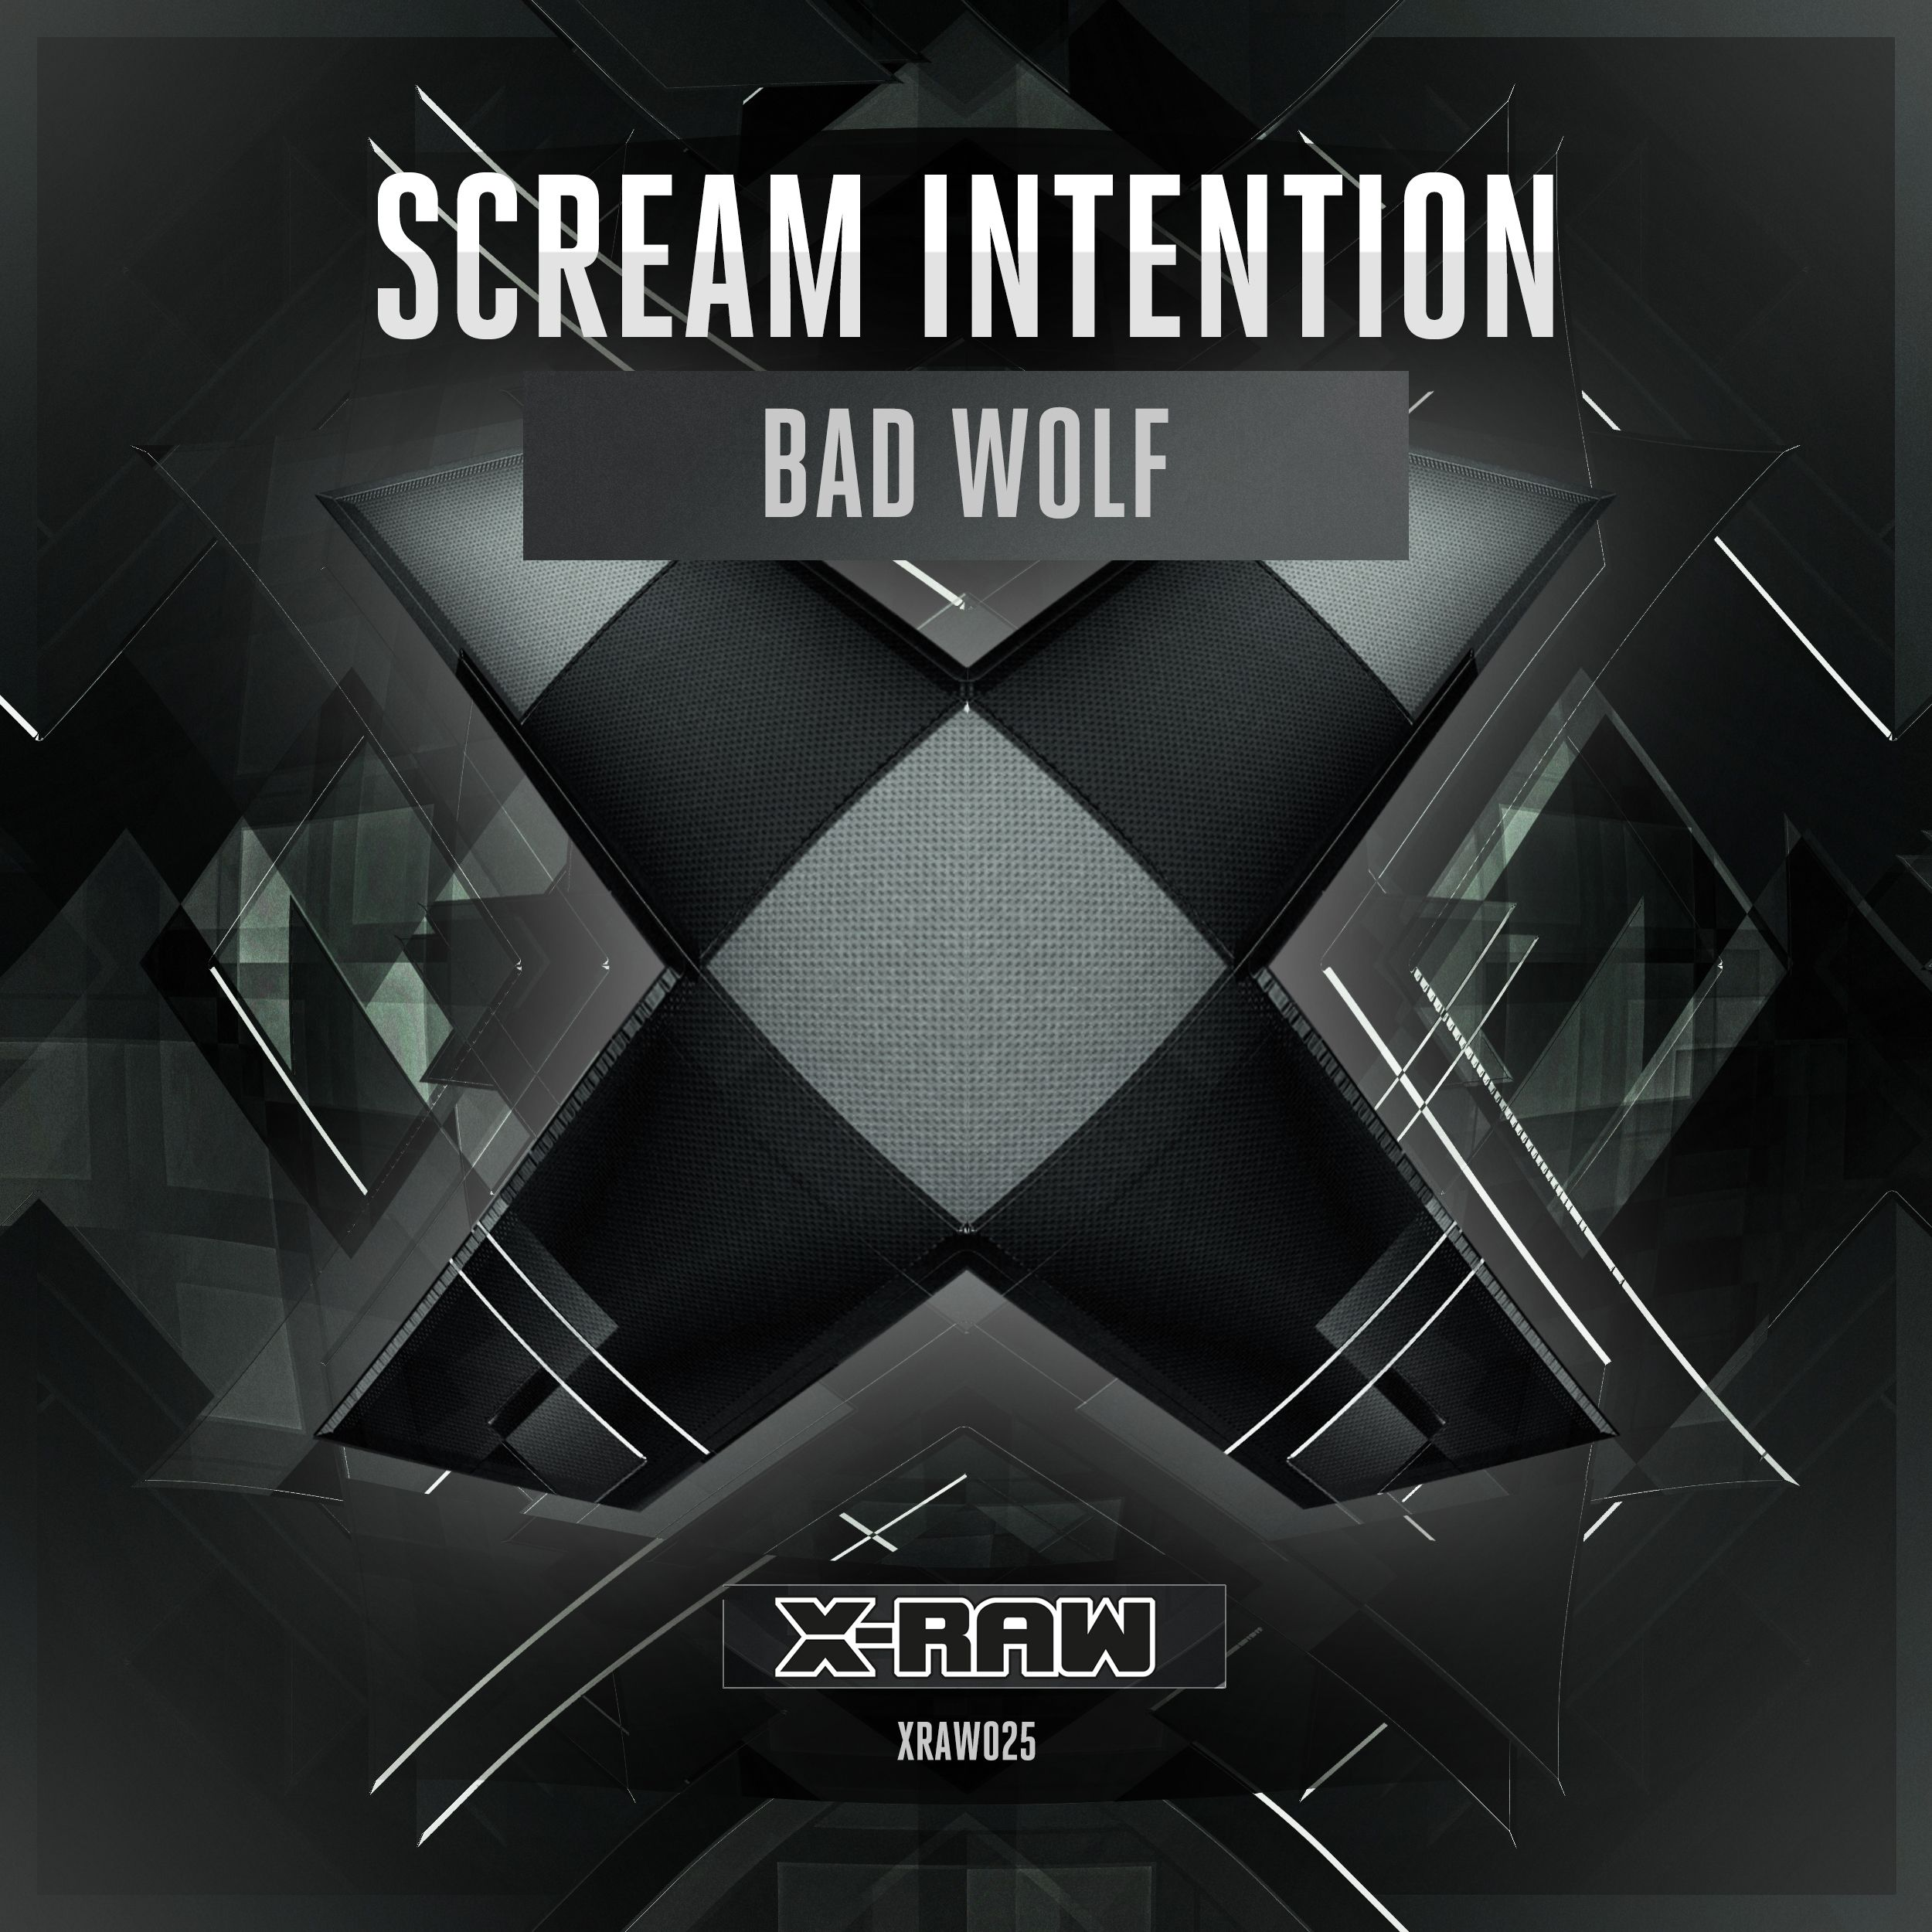 Scream Intention - Bad Wolf [X-RAW] XRAW025